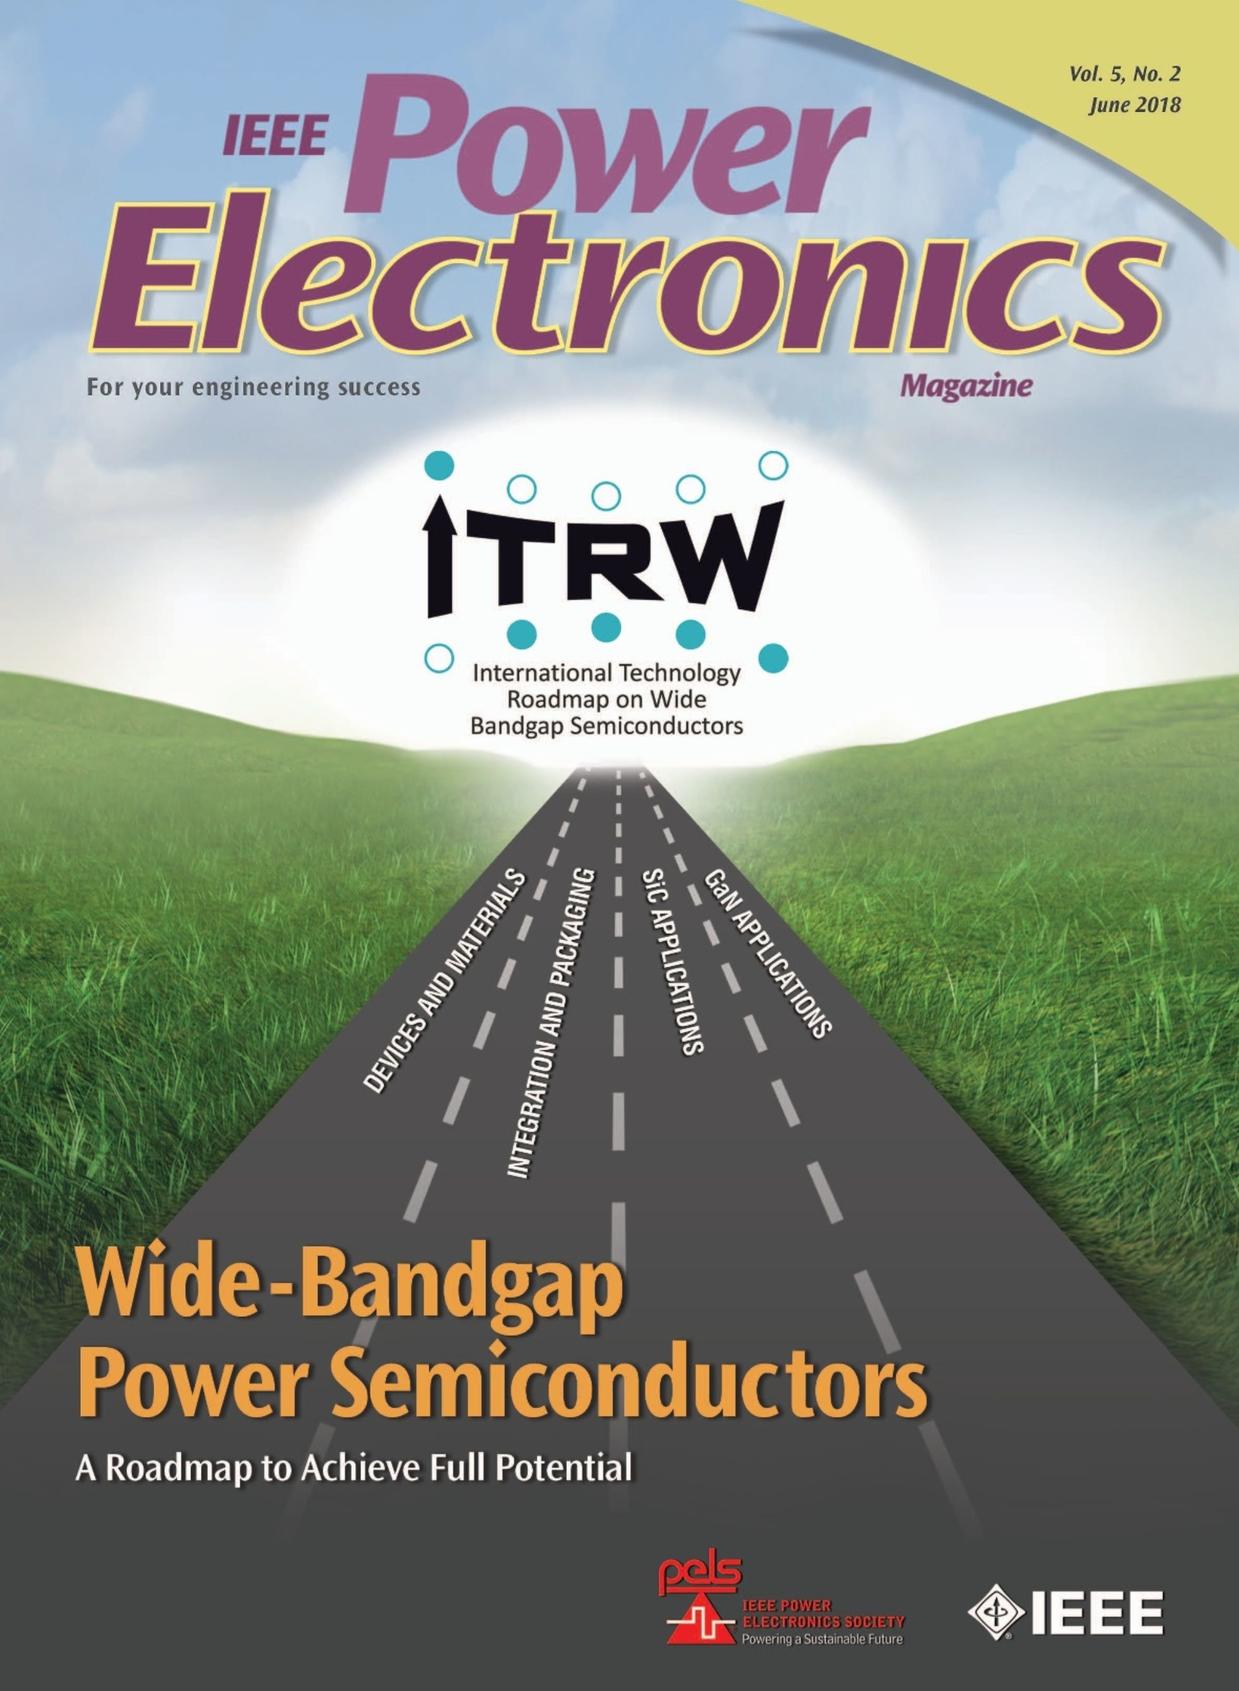 IEEE Power Electronics Magazine - June 2018